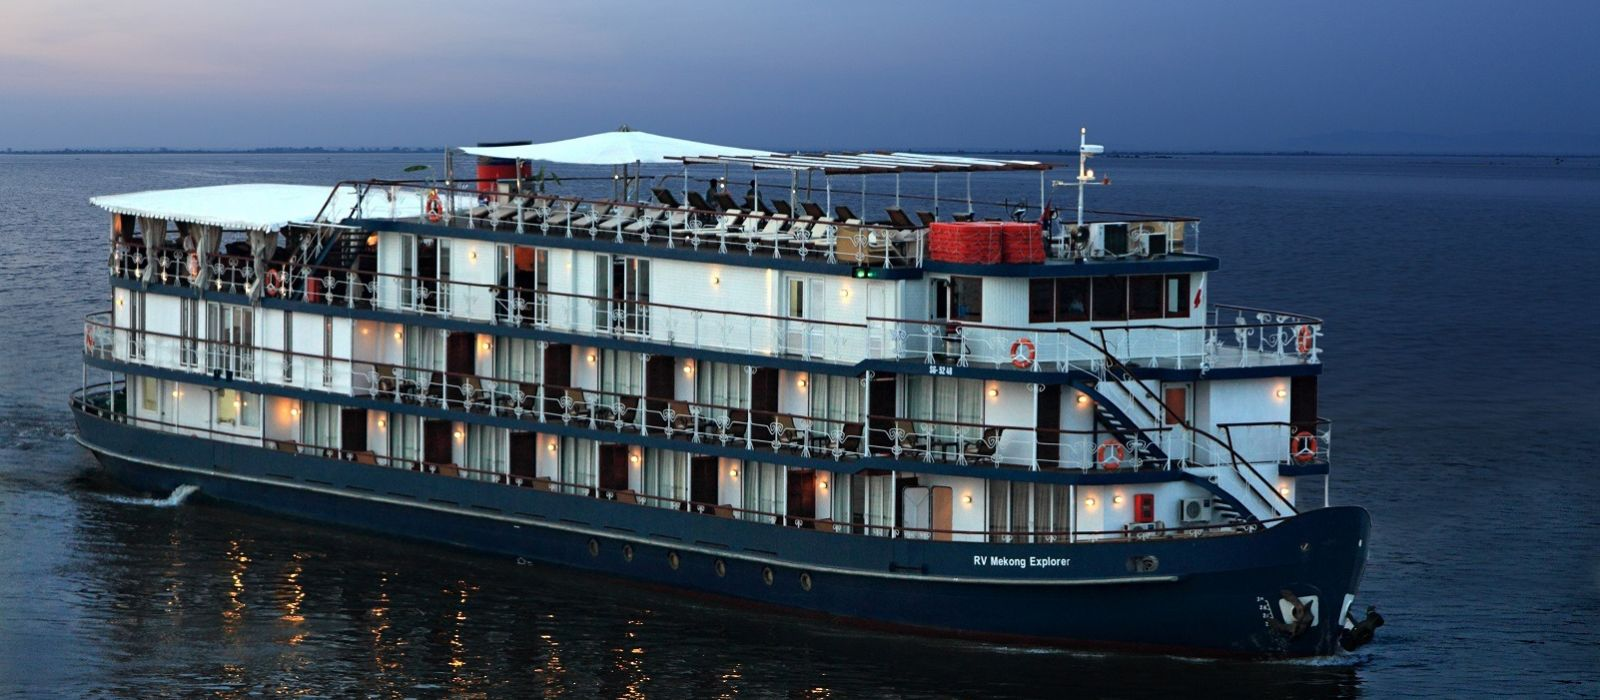 Hotel Jayavarman Cruise on the Mekong Delta: My Tho – Phnom Penh, Four Days Vietnam